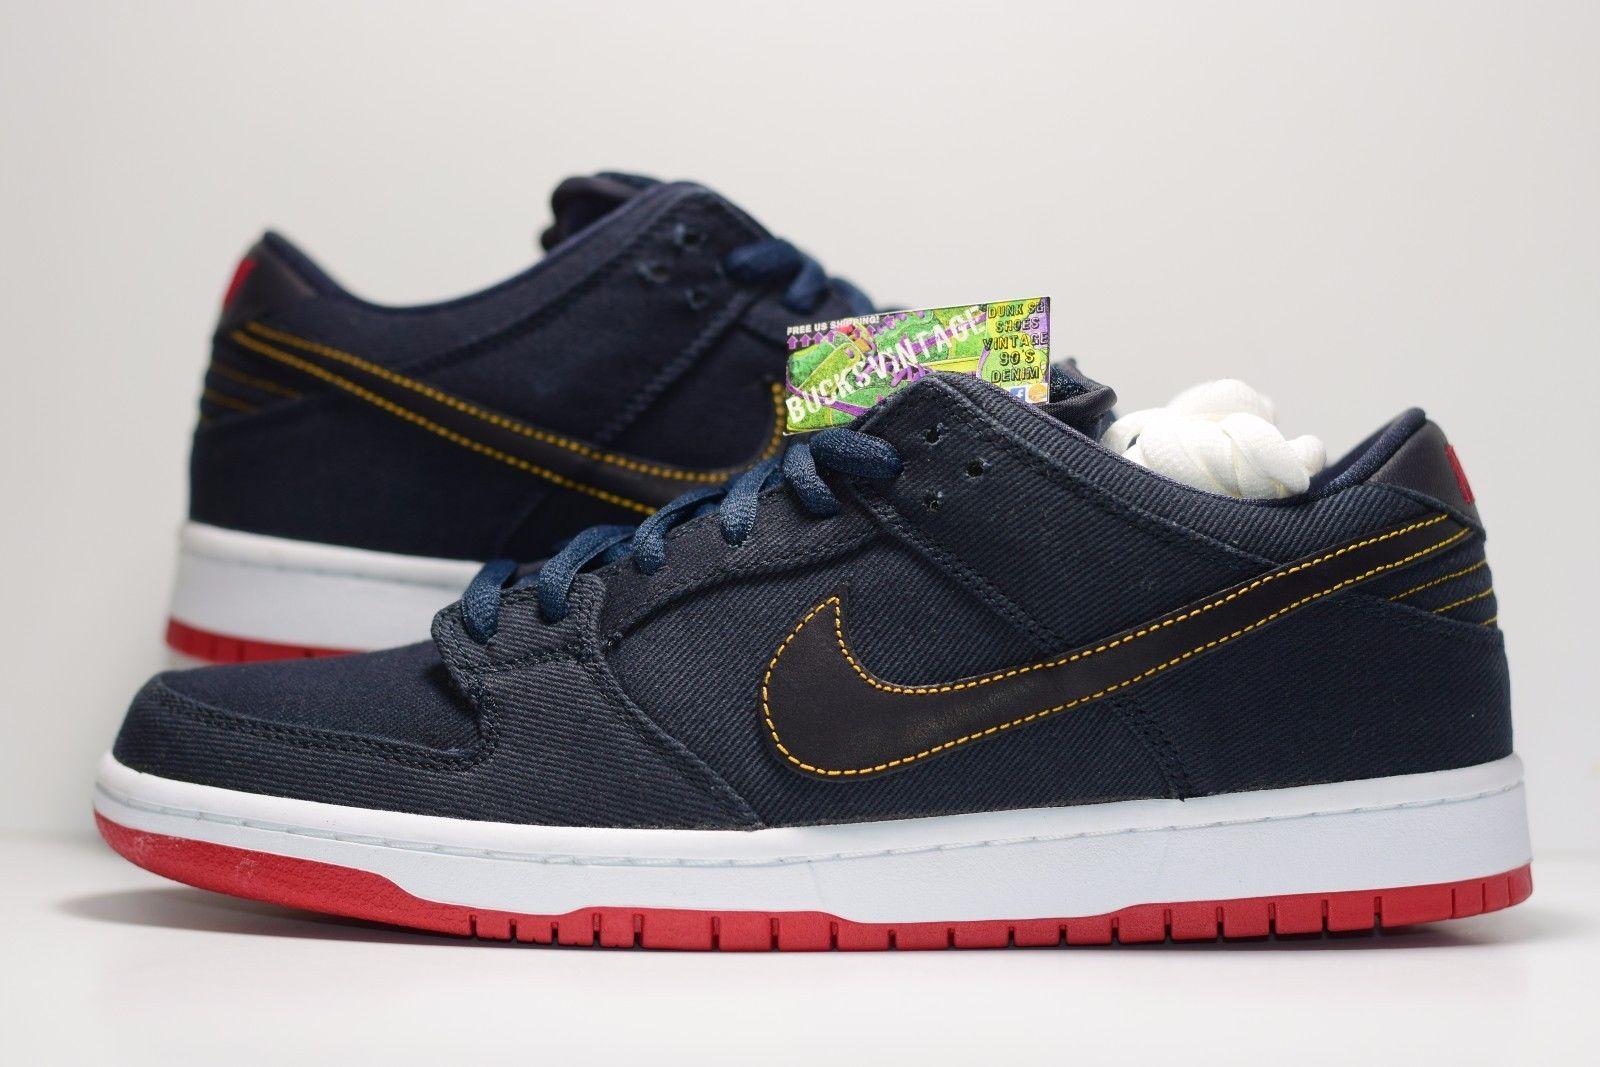 best sneakers b6fde b66f4 Size 10.5 | DS SAMPLE Nike Dunk SB LEVIS Blue Hyperstrike from BucksVintage